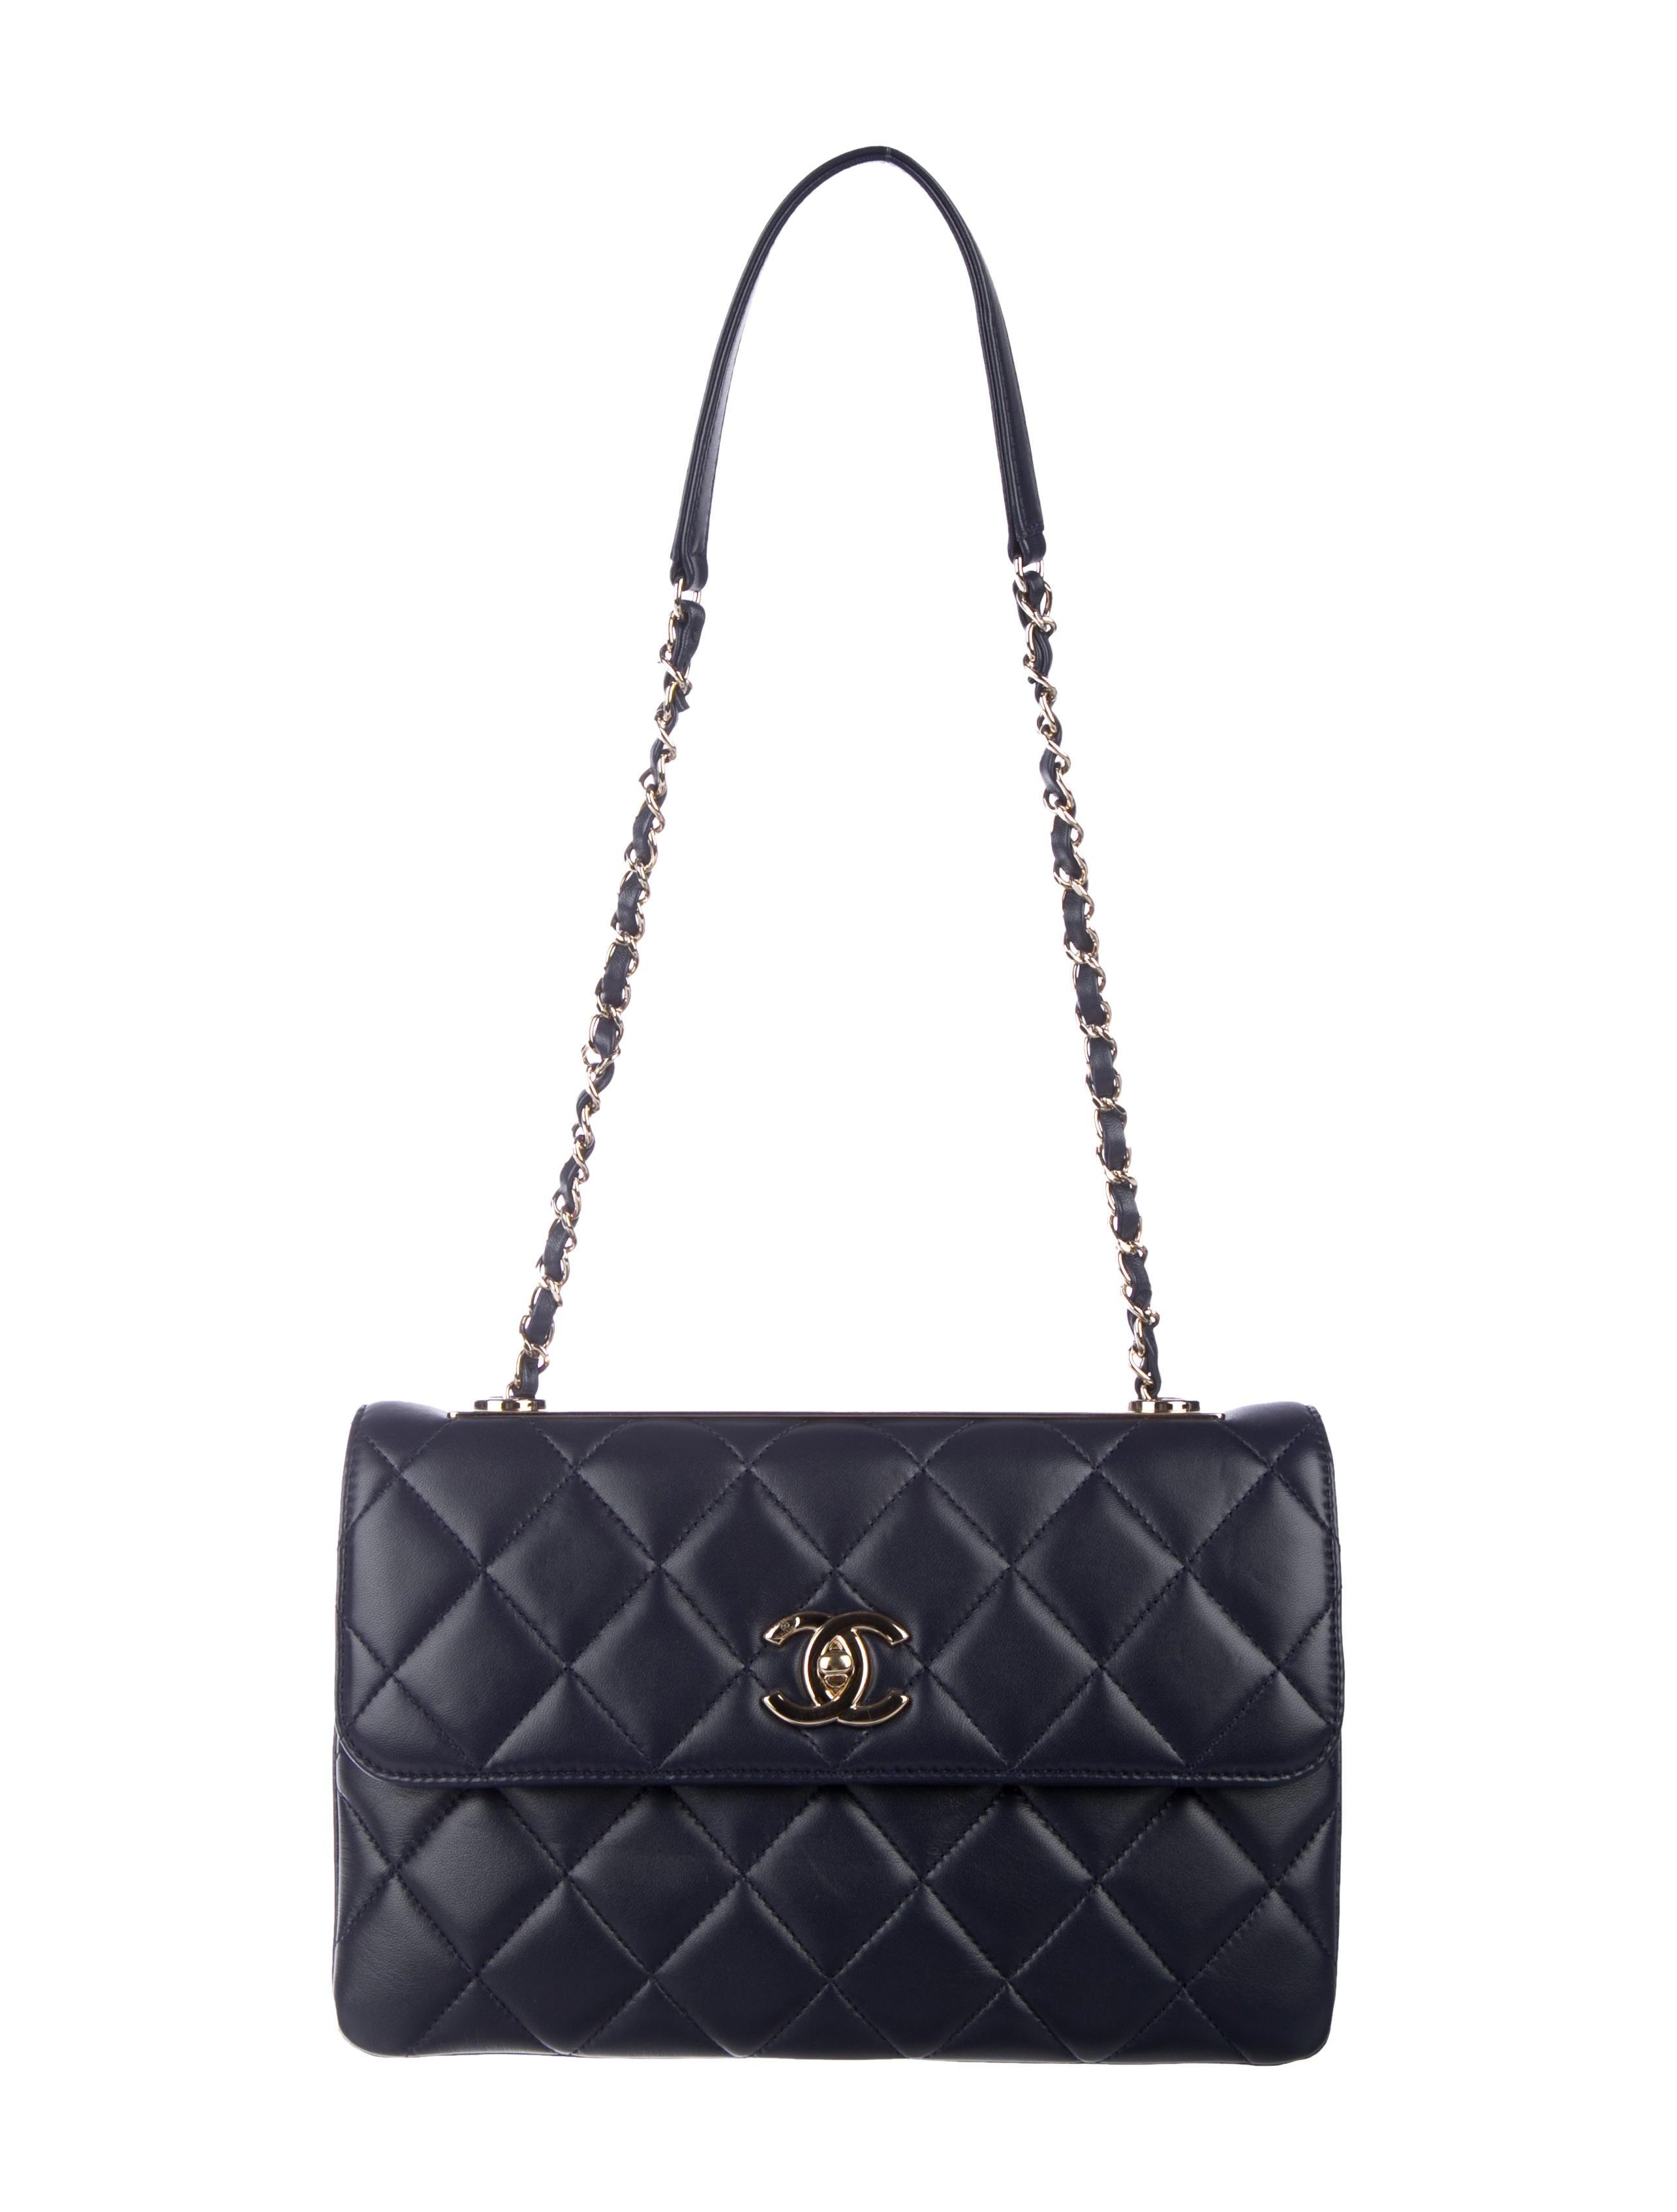 2017 Trendy Cc Flap Bag by Chanel